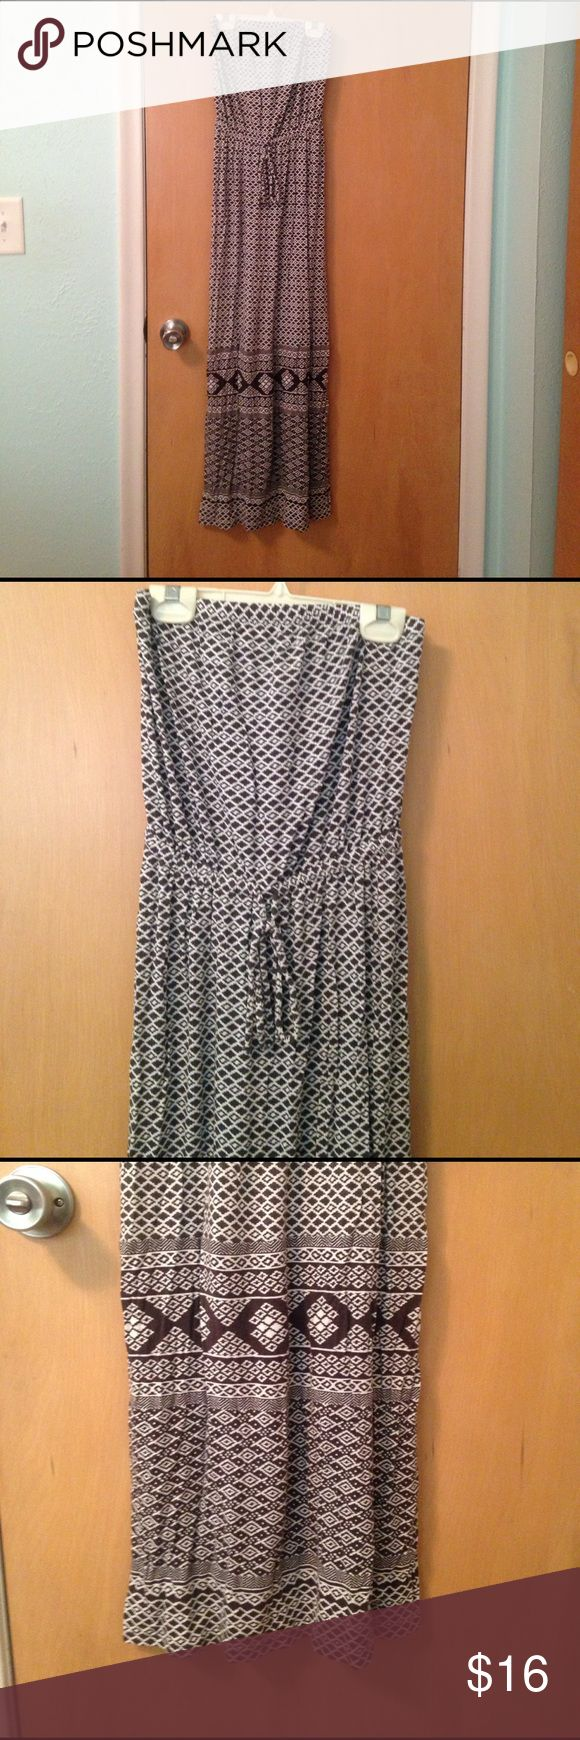 Old Navy strapless maxi dress, XS petite Old Navy maxi dress, strapless with elastic at top and at waist , tie at waist. Lightweight jersey fabric. Black and white geometric design. Straight skirt, no side slit. XS petite. Old Navy Dresses Maxi